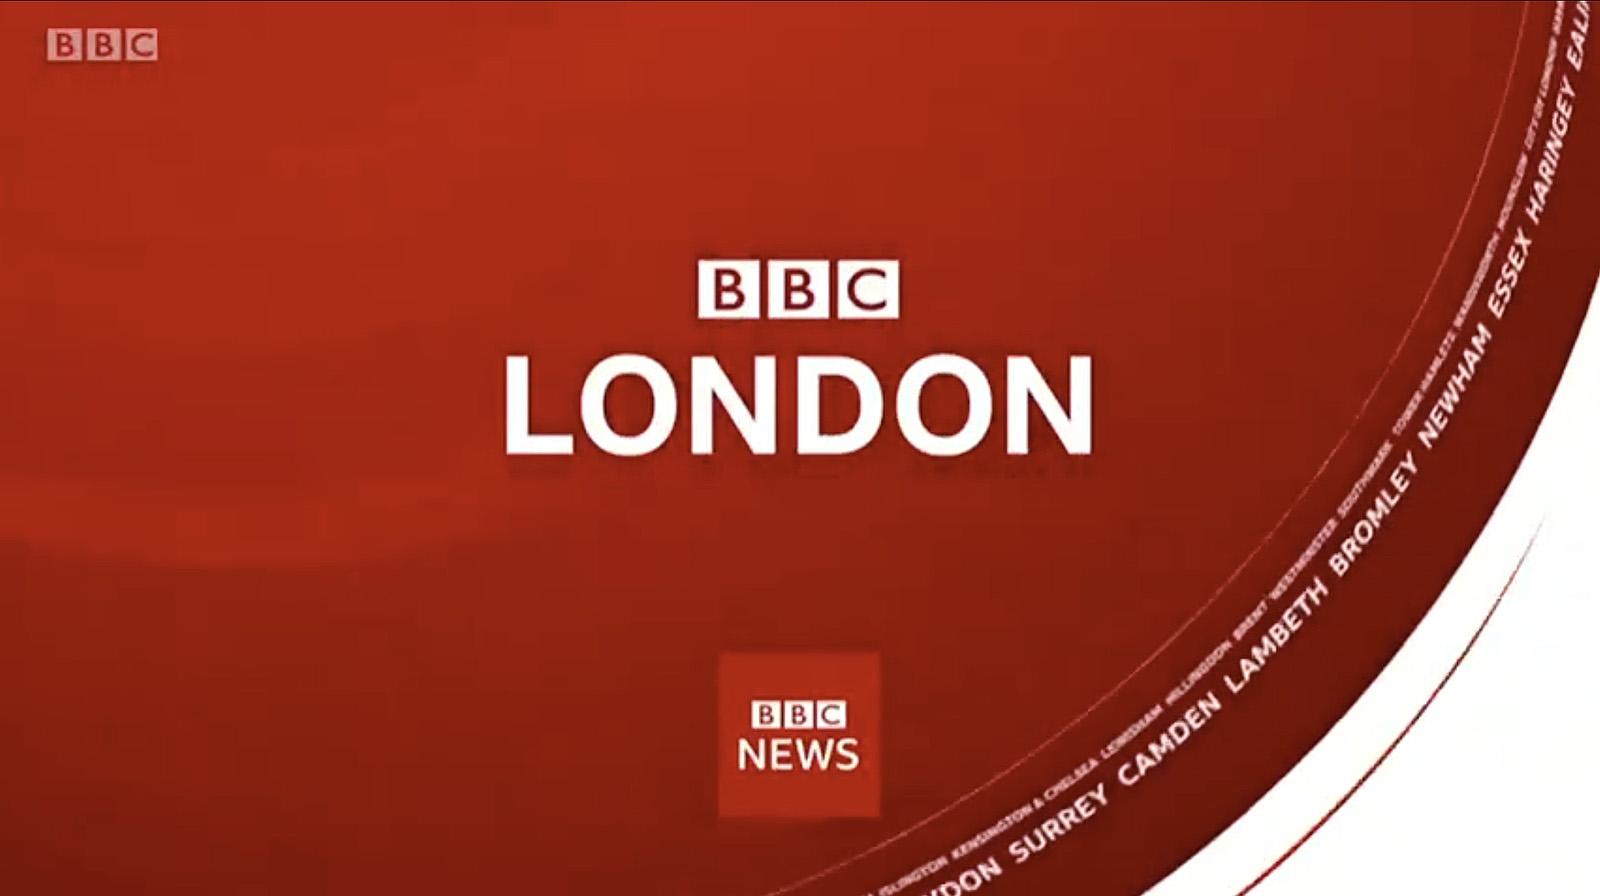 NCS_BBC-Rebrand-Reith-2019_052